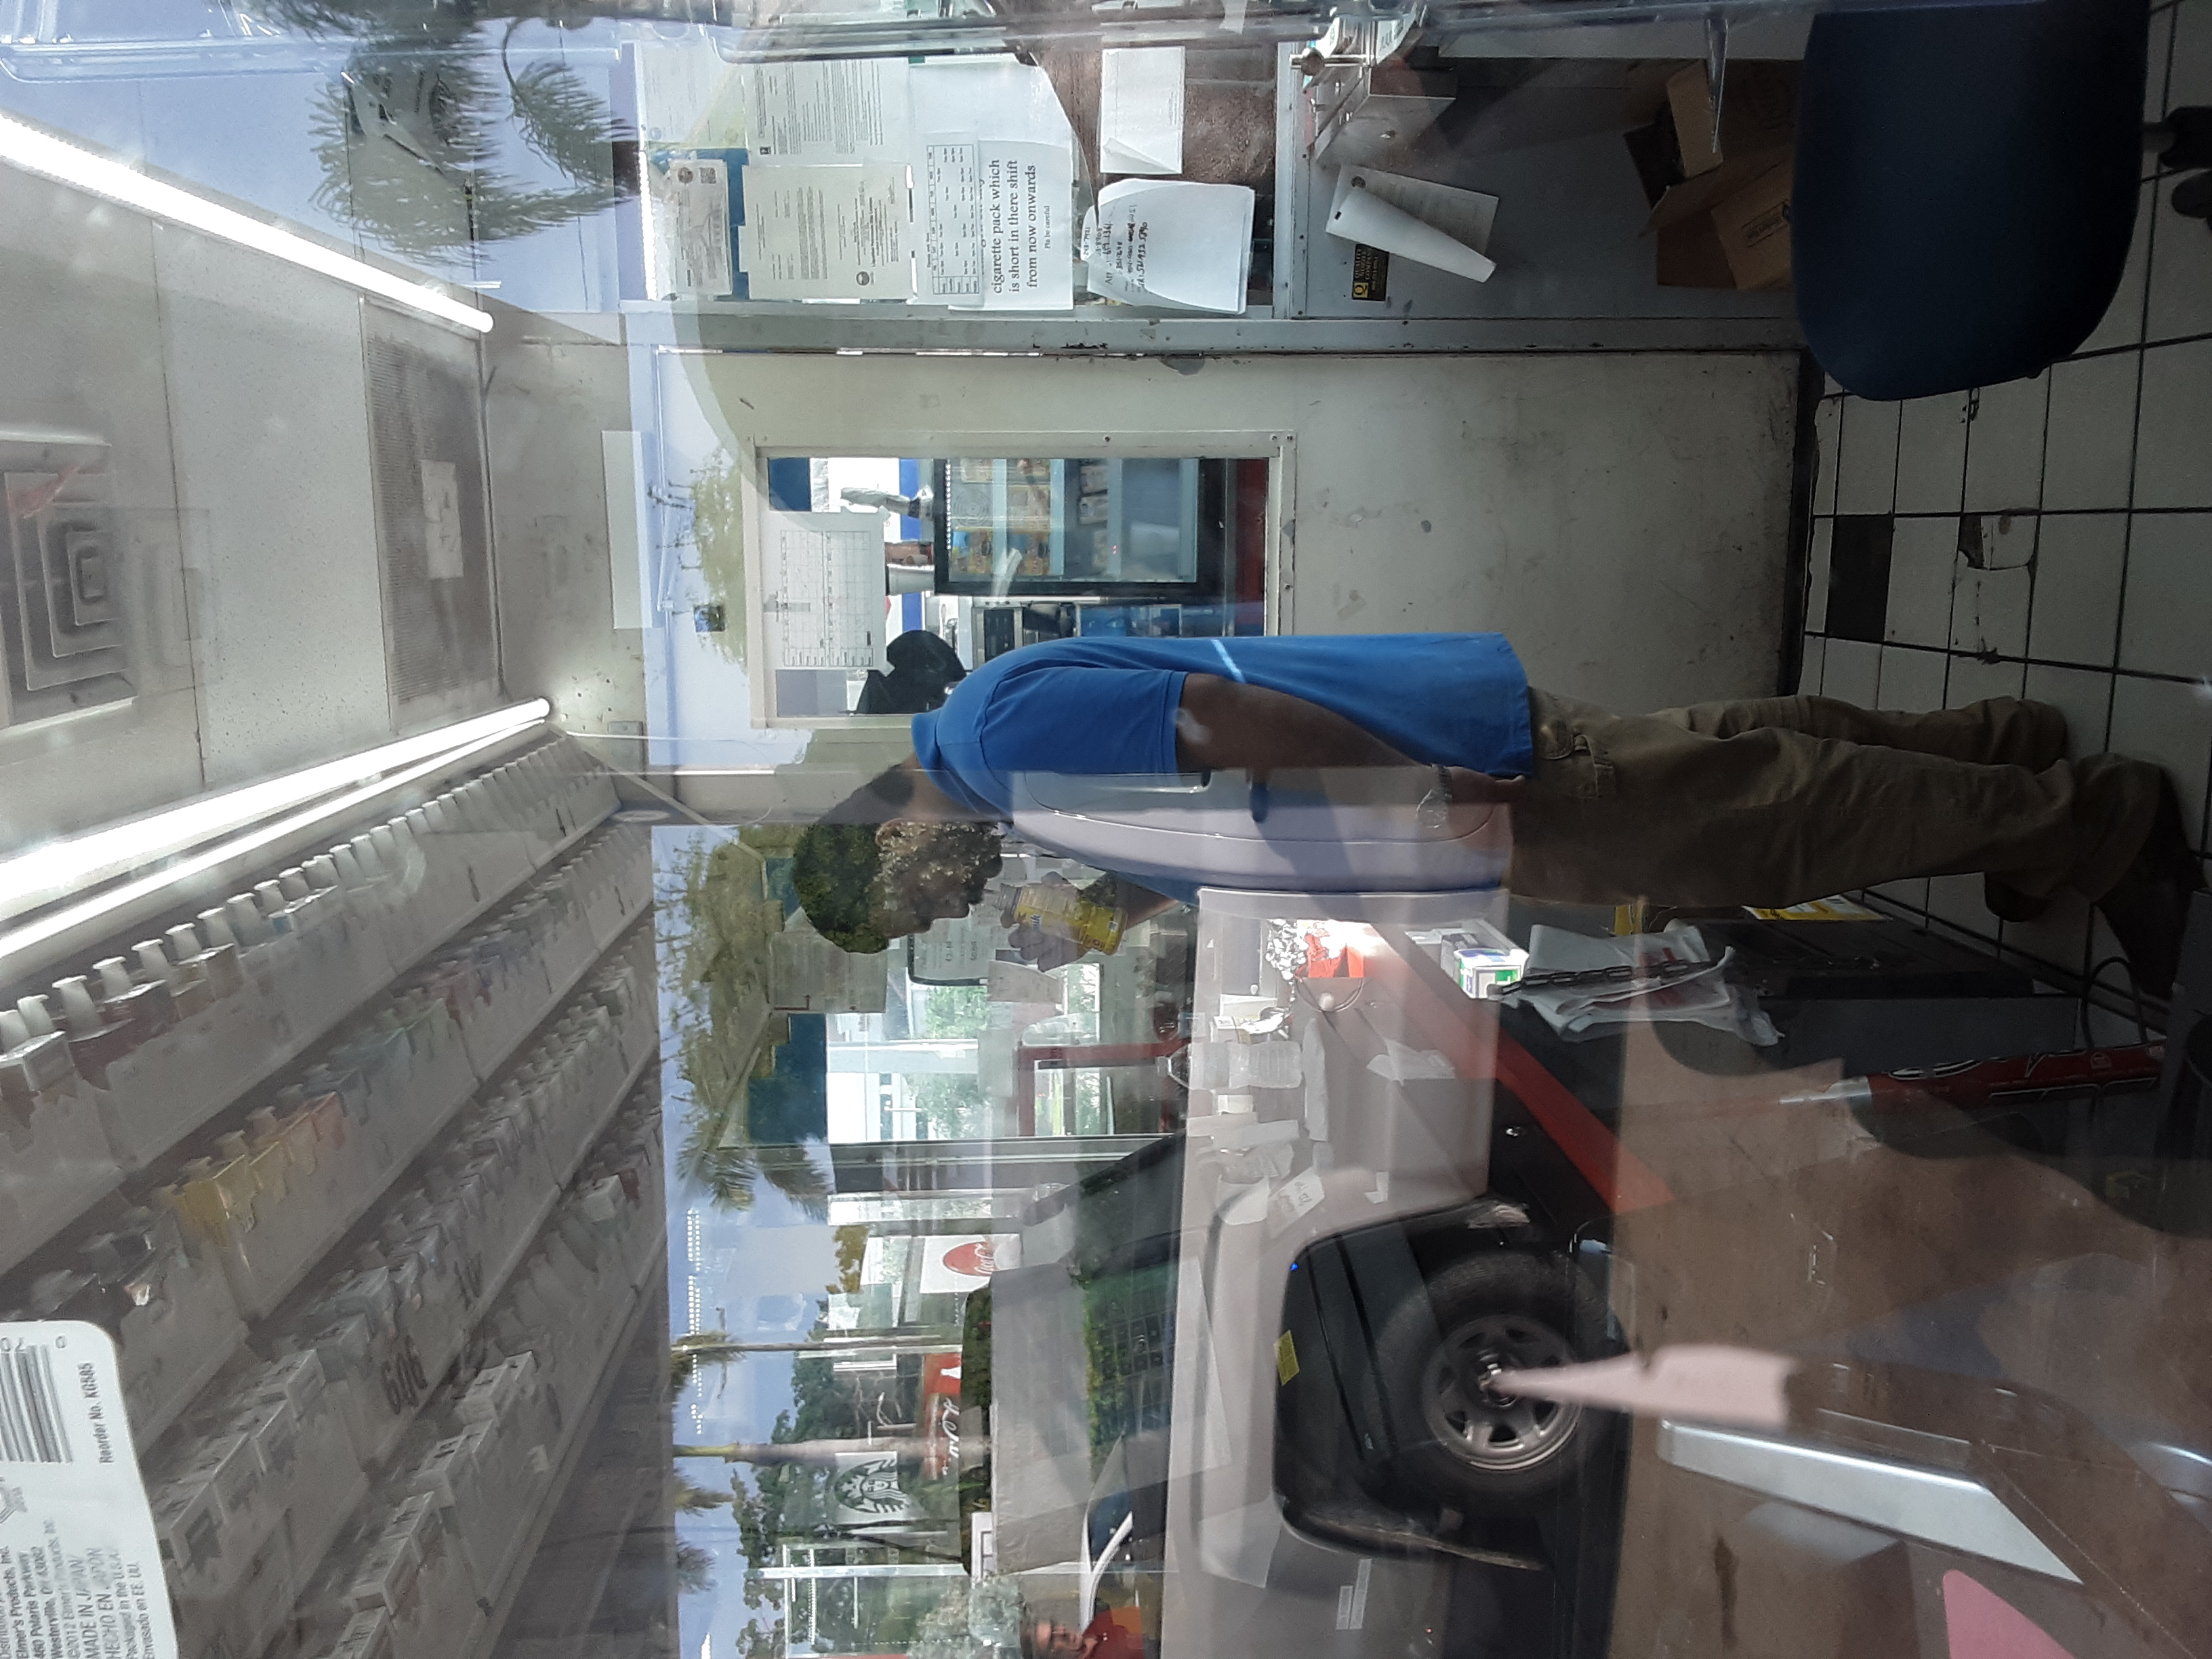 chevron customer service complaints department